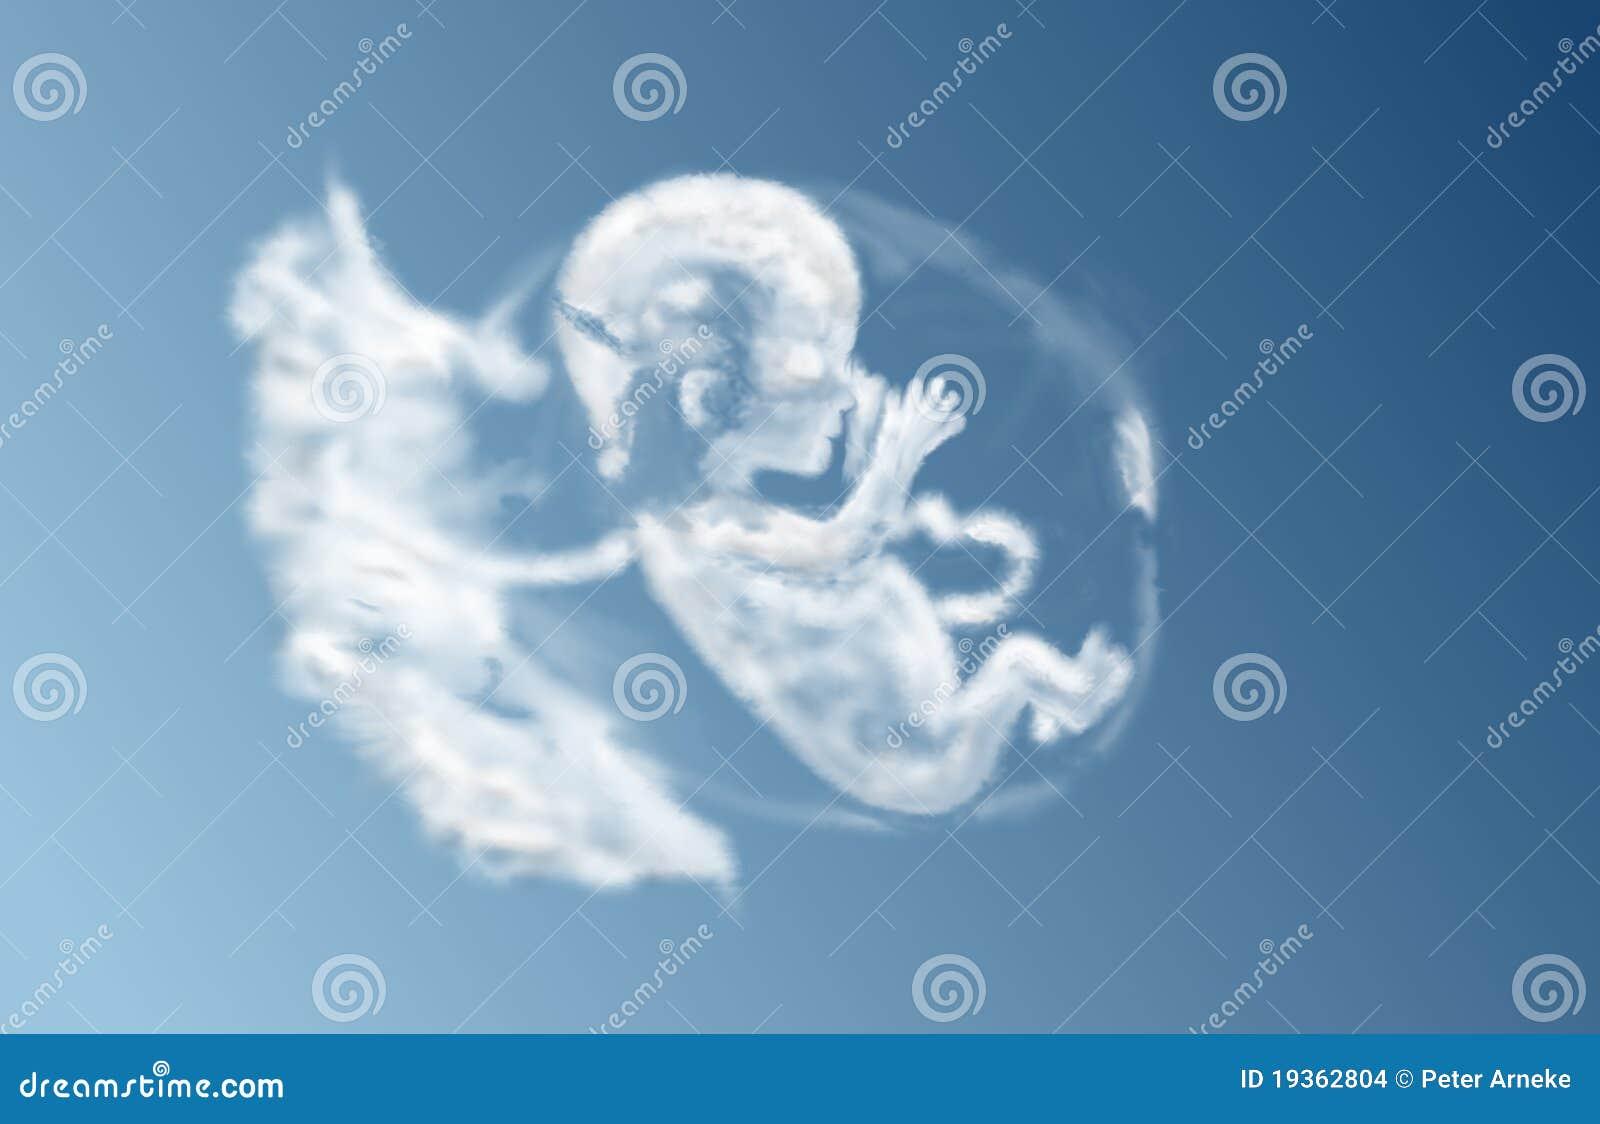 Unborn child cloud